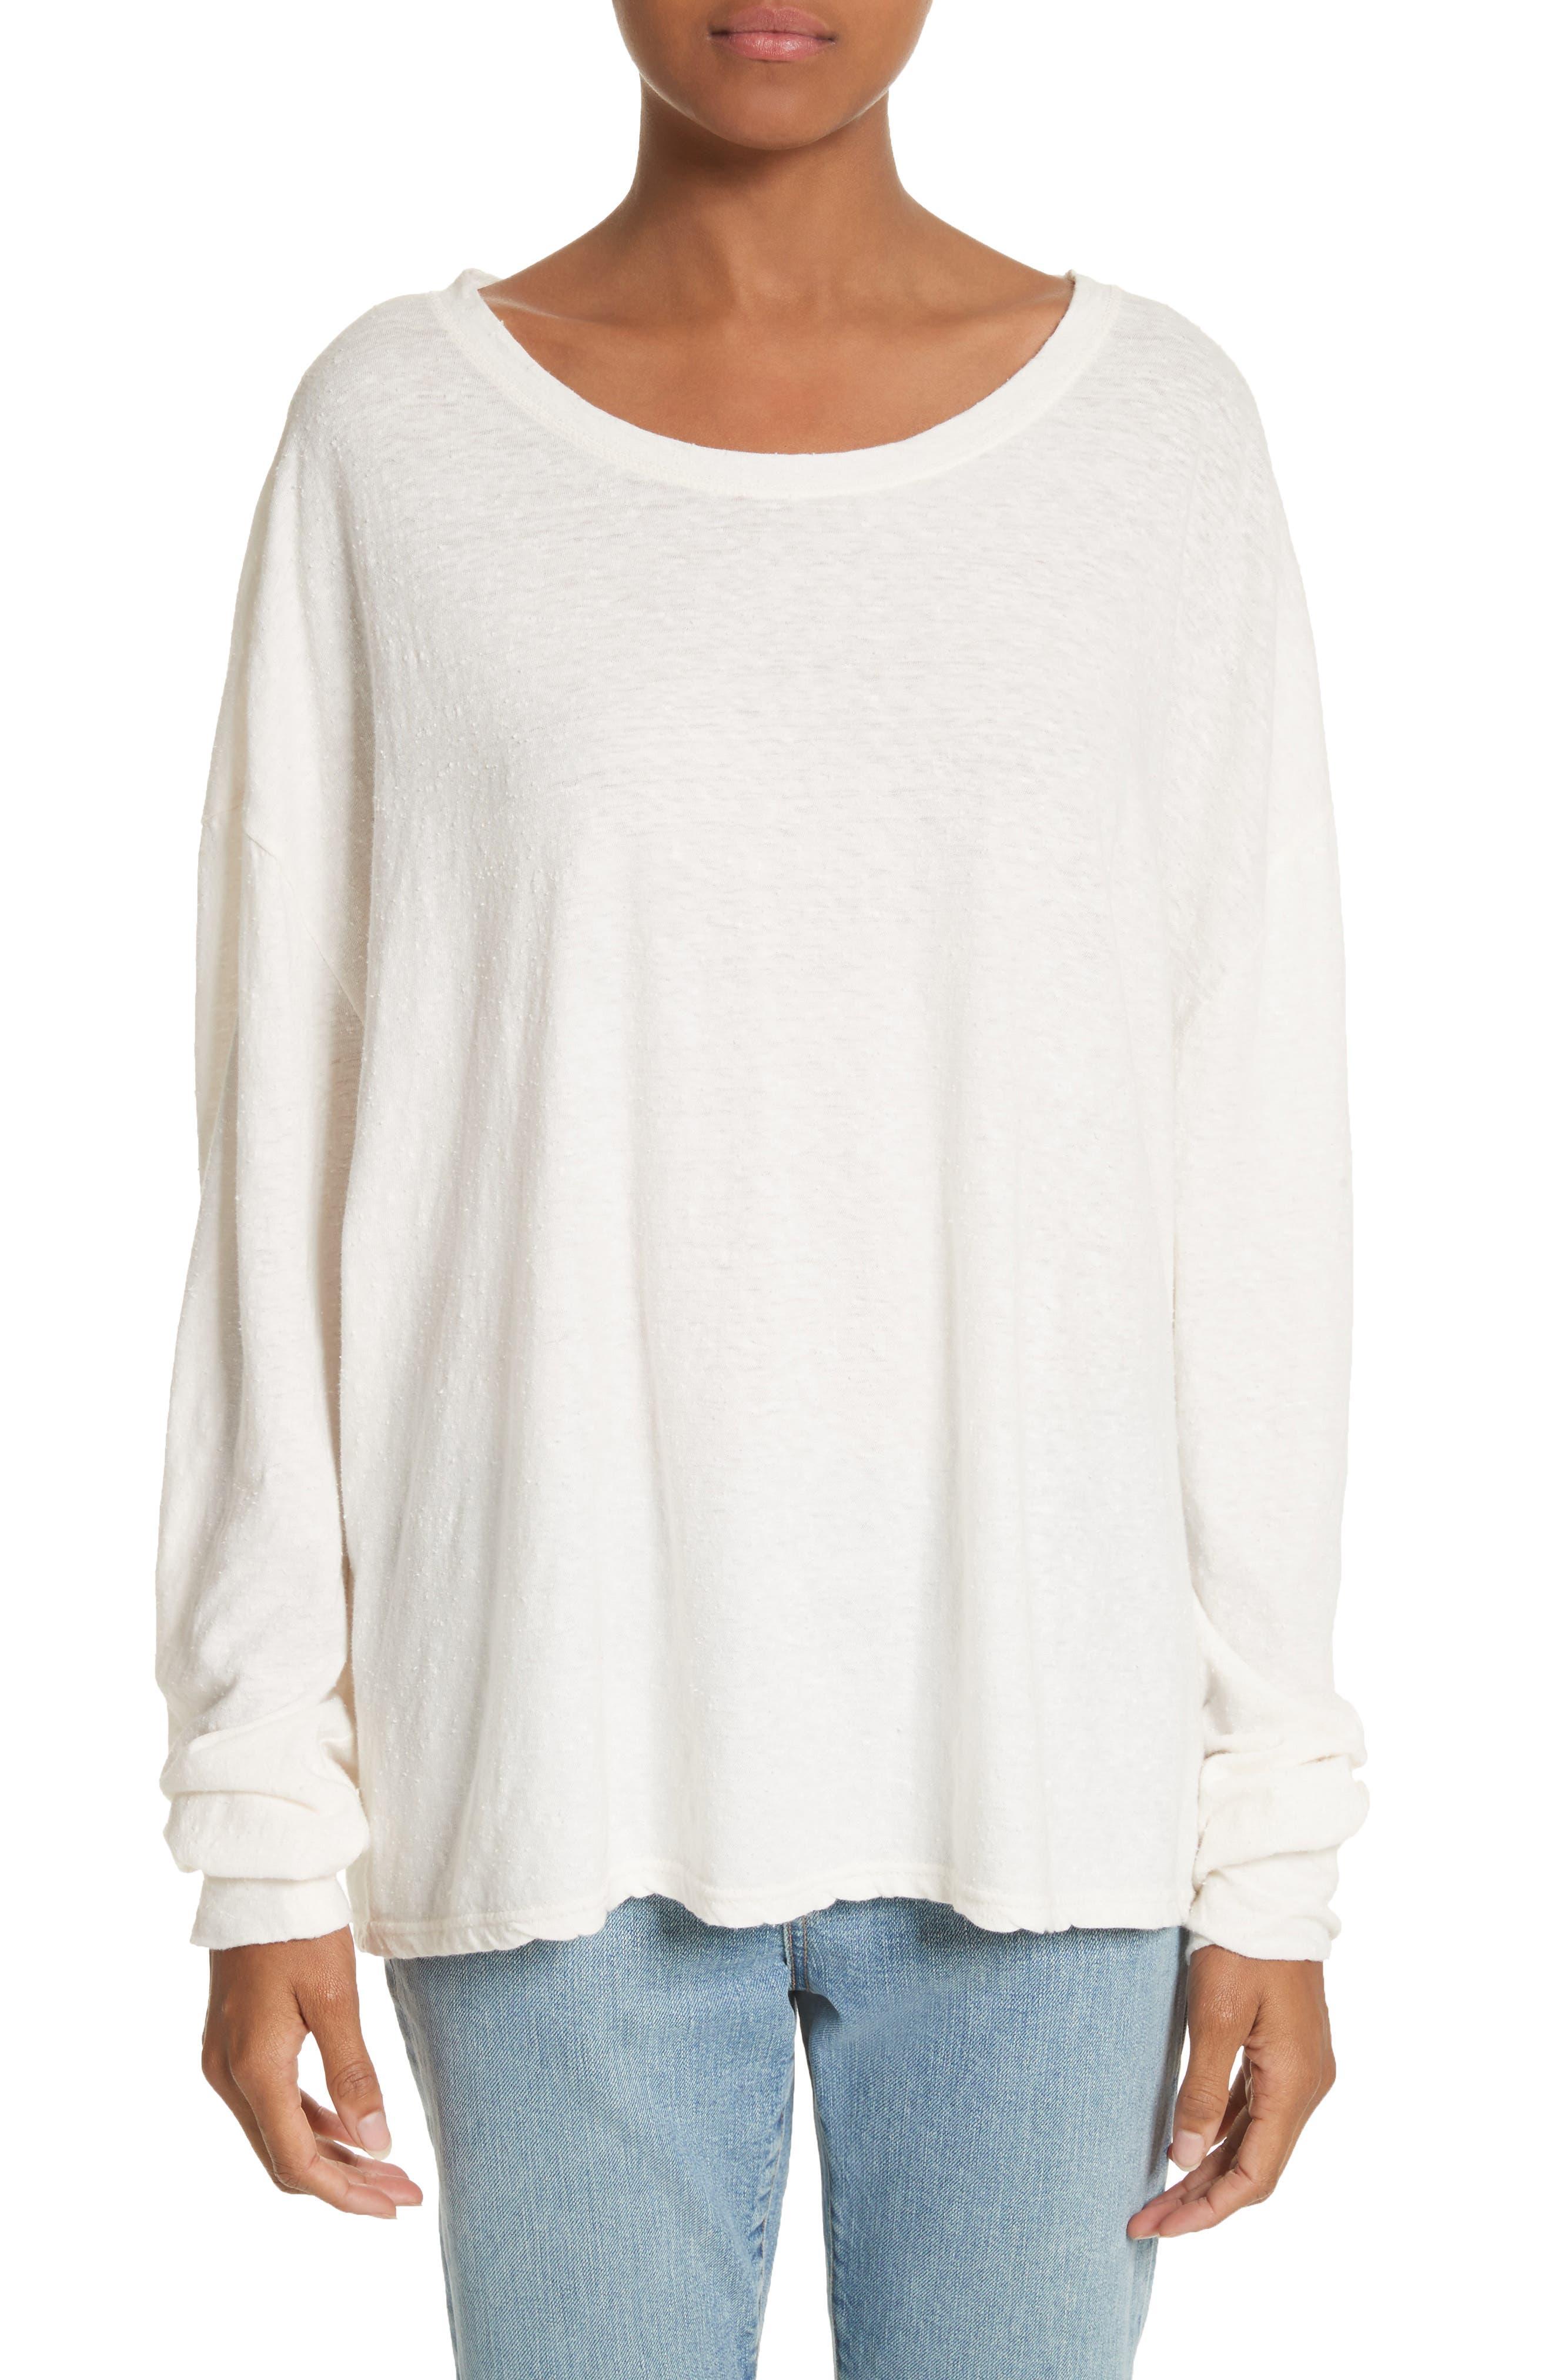 Solano Oversize Cotton Top,                             Main thumbnail 1, color,                             White